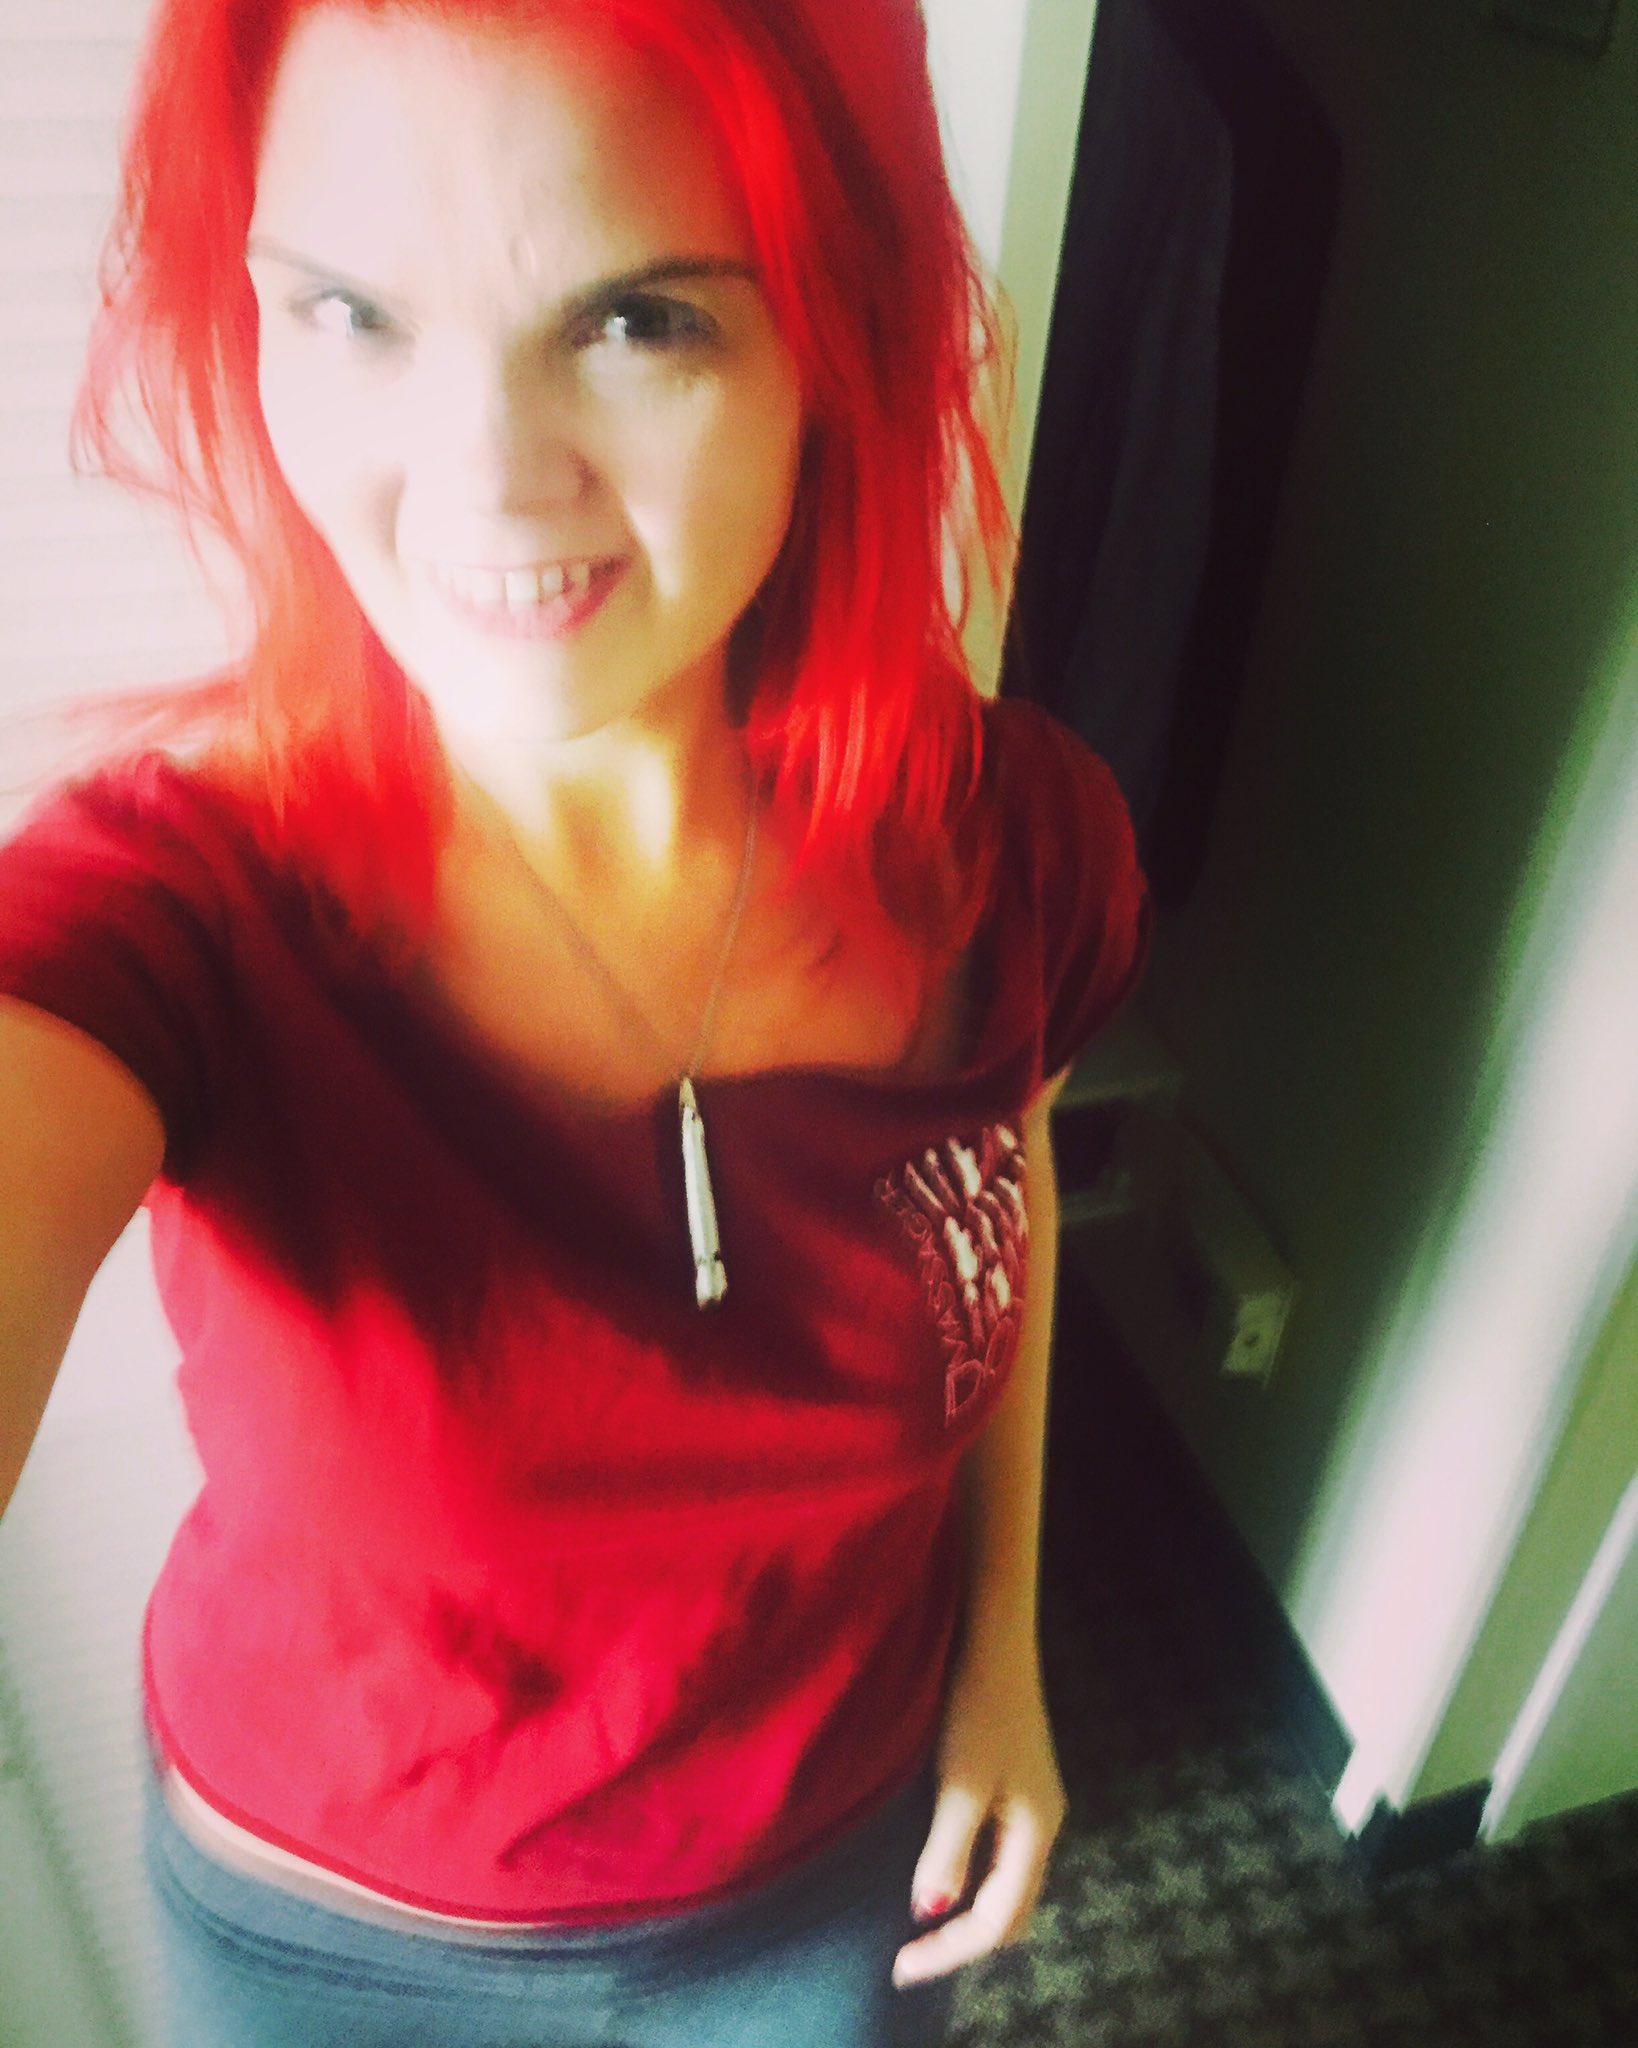 Thumbnail for Redhead Bedhead & Doxy at #SFS16